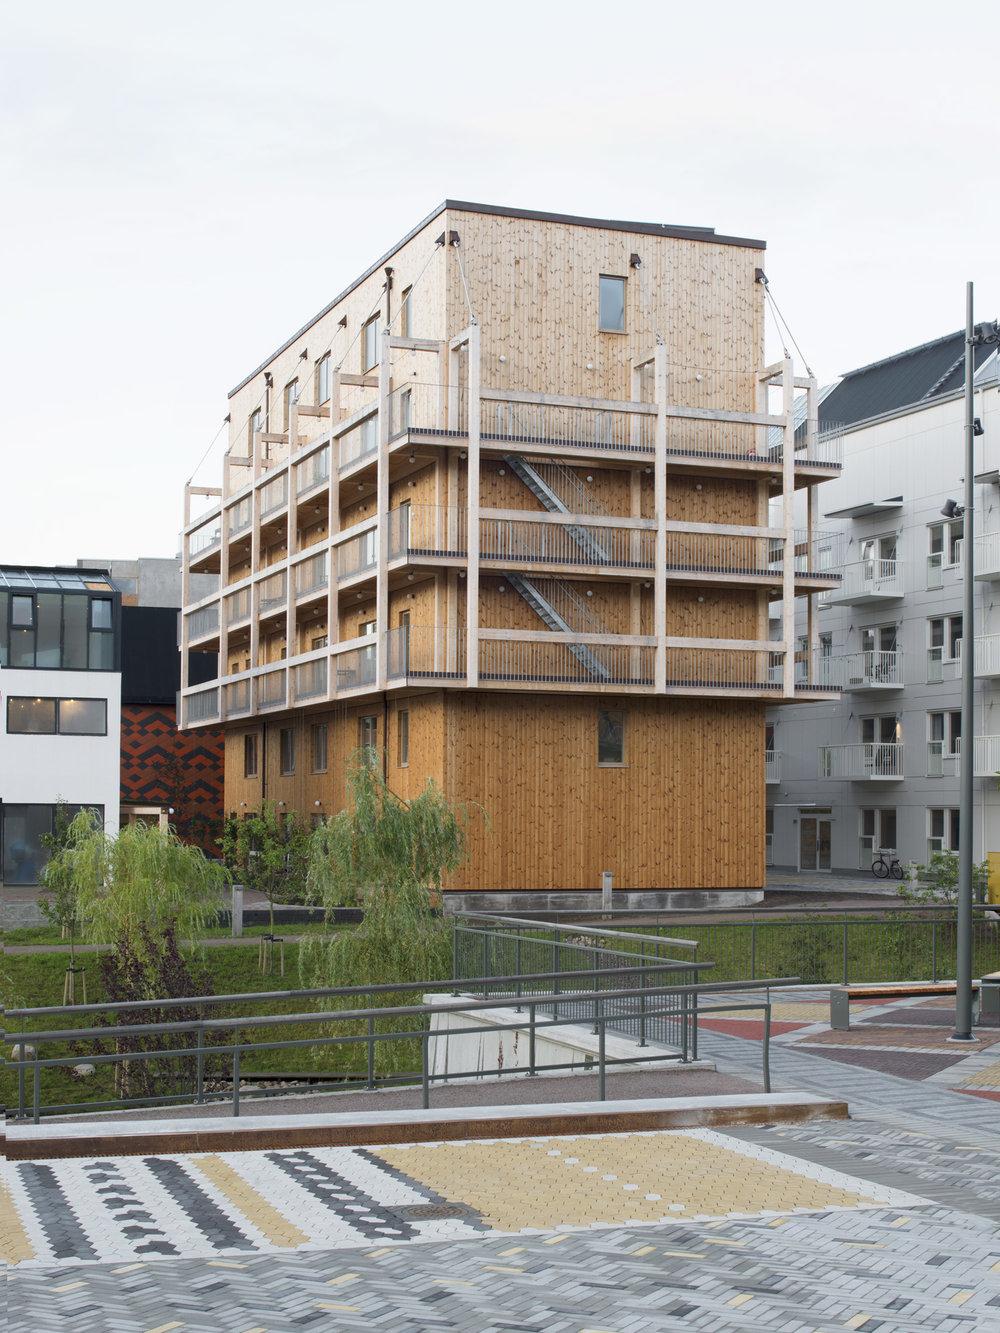 Traloftet-SPRIDD-©MikaelOlsson3853b-2.jpg